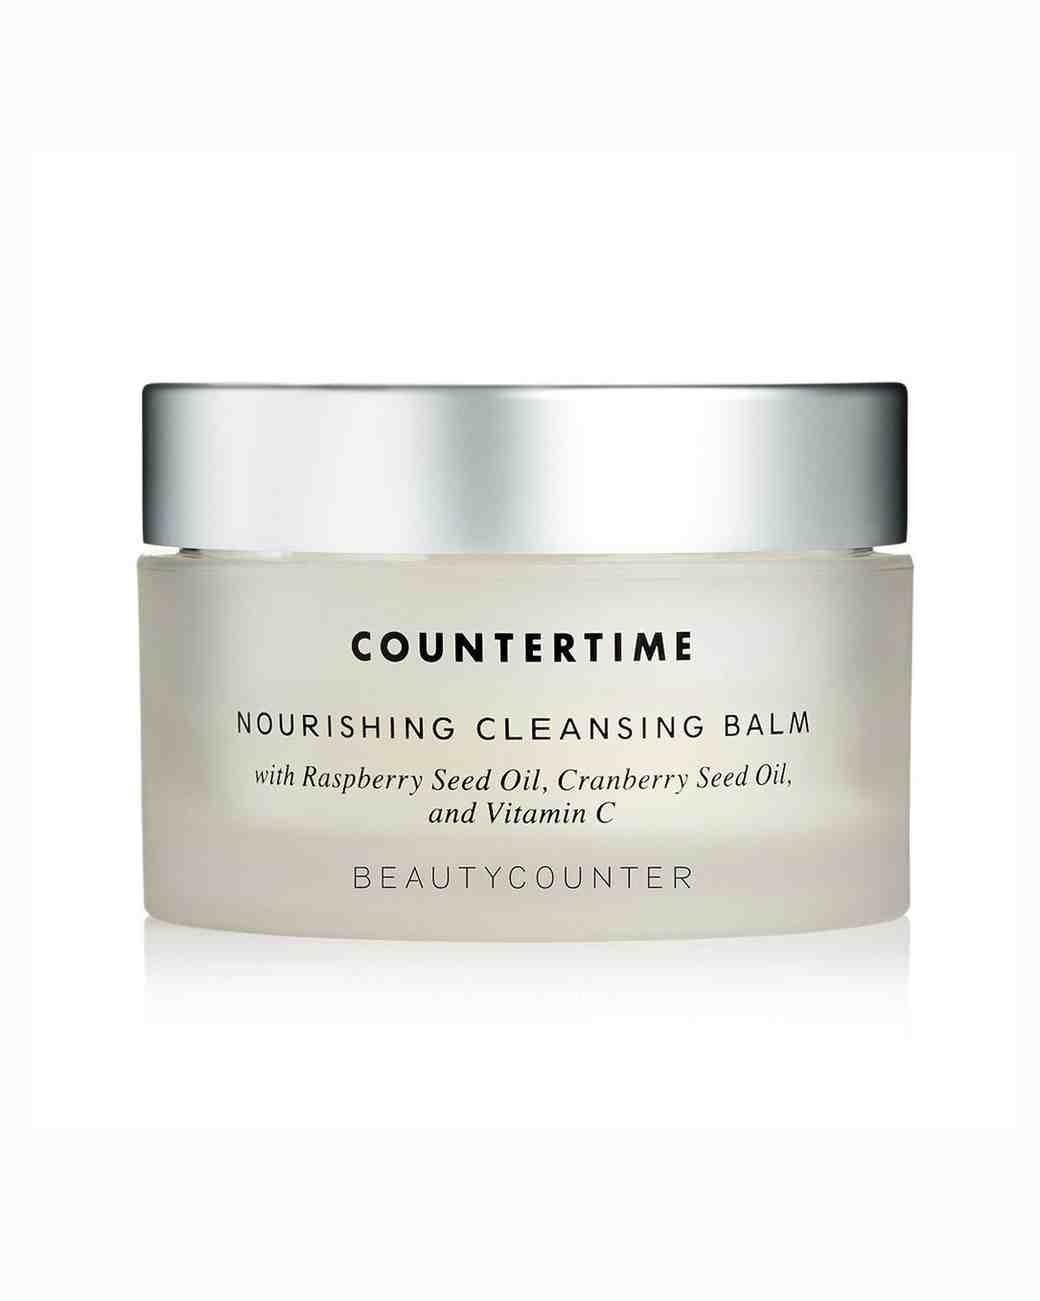 big-day-beauty-awards-beautycounter-cleansing-balm-0216.jpg